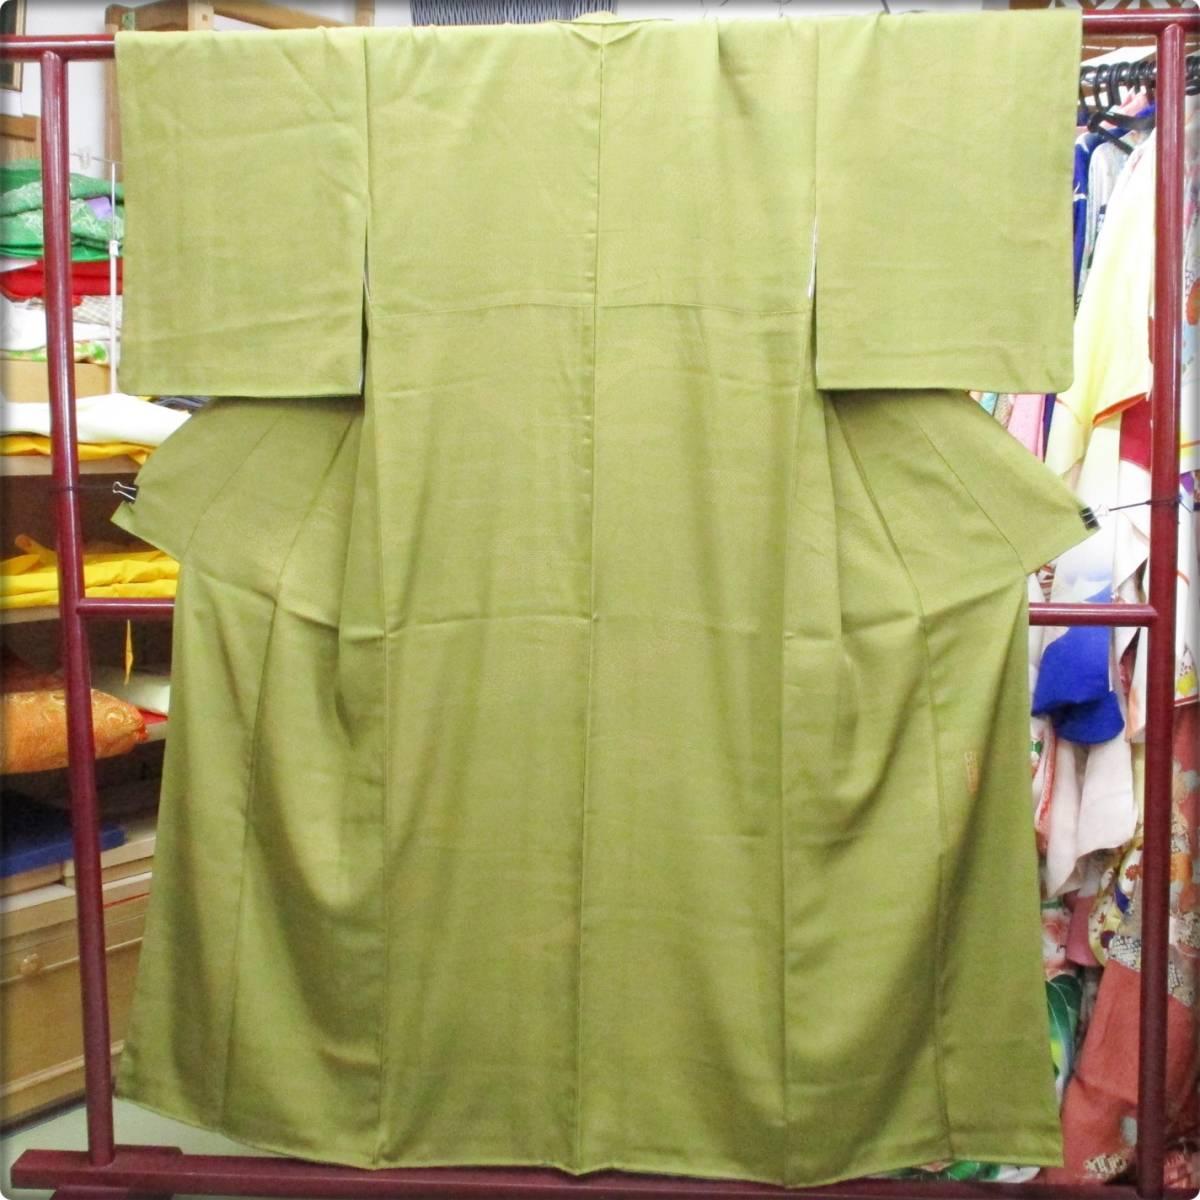 《ジャムルK》AGY12-61 ◆送料無料◆ 重要無形文化財 人間国宝 中村勇二郎 小紋 正絹